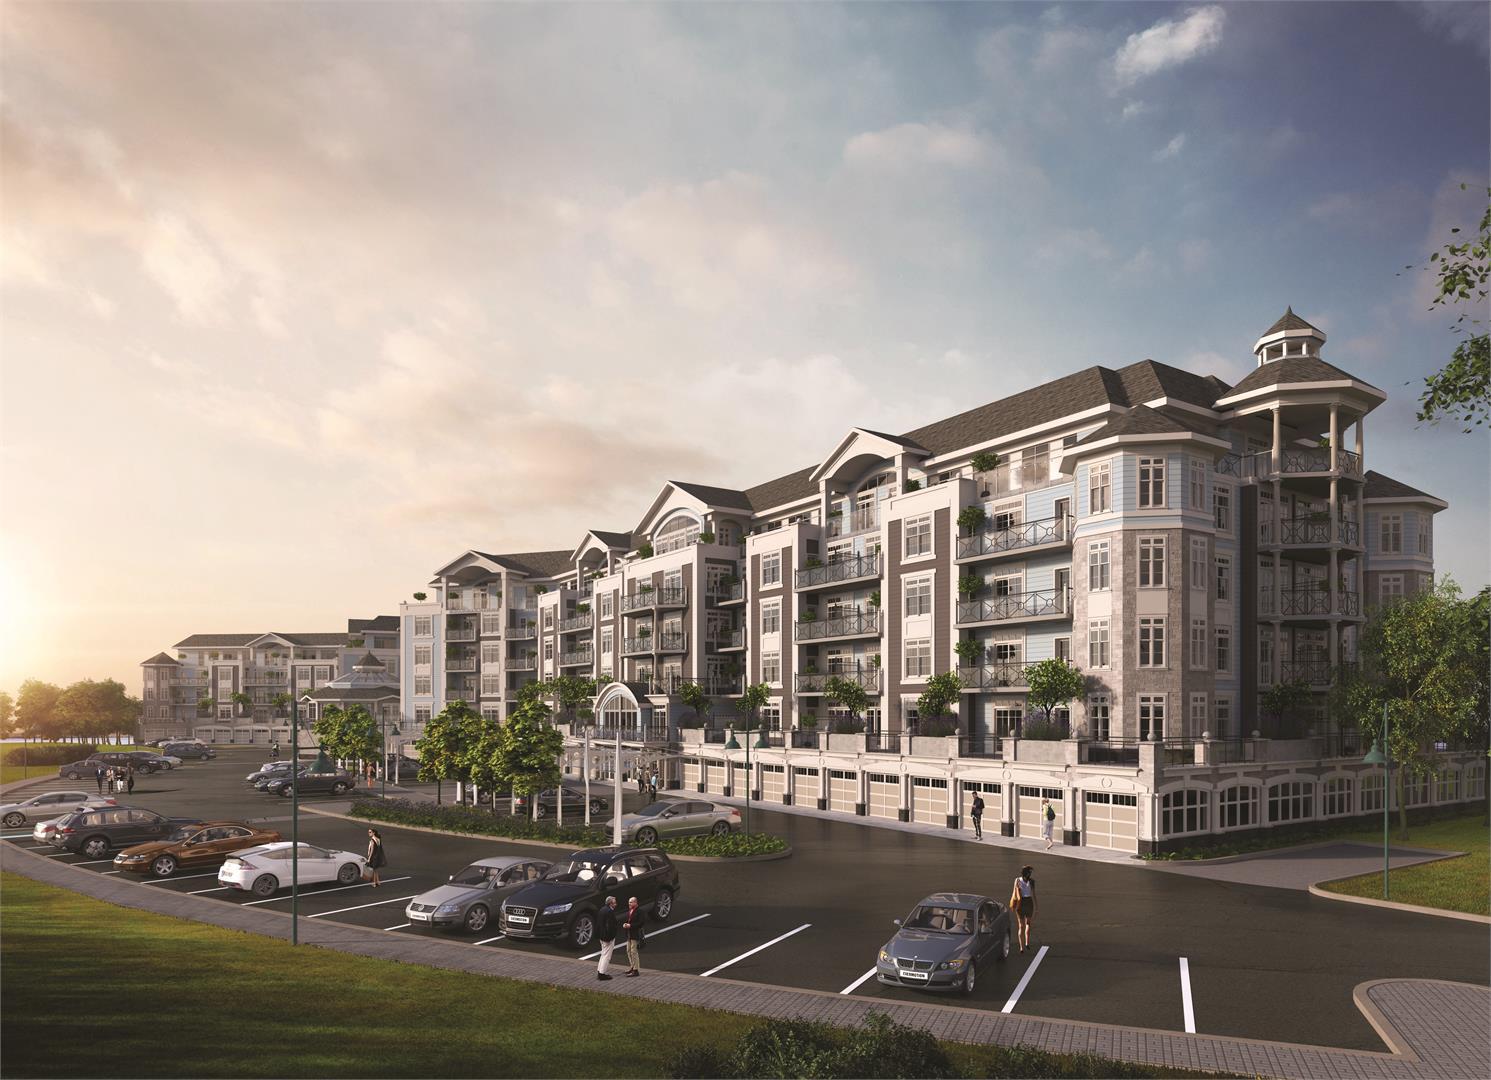 The South Shore Condos Phase